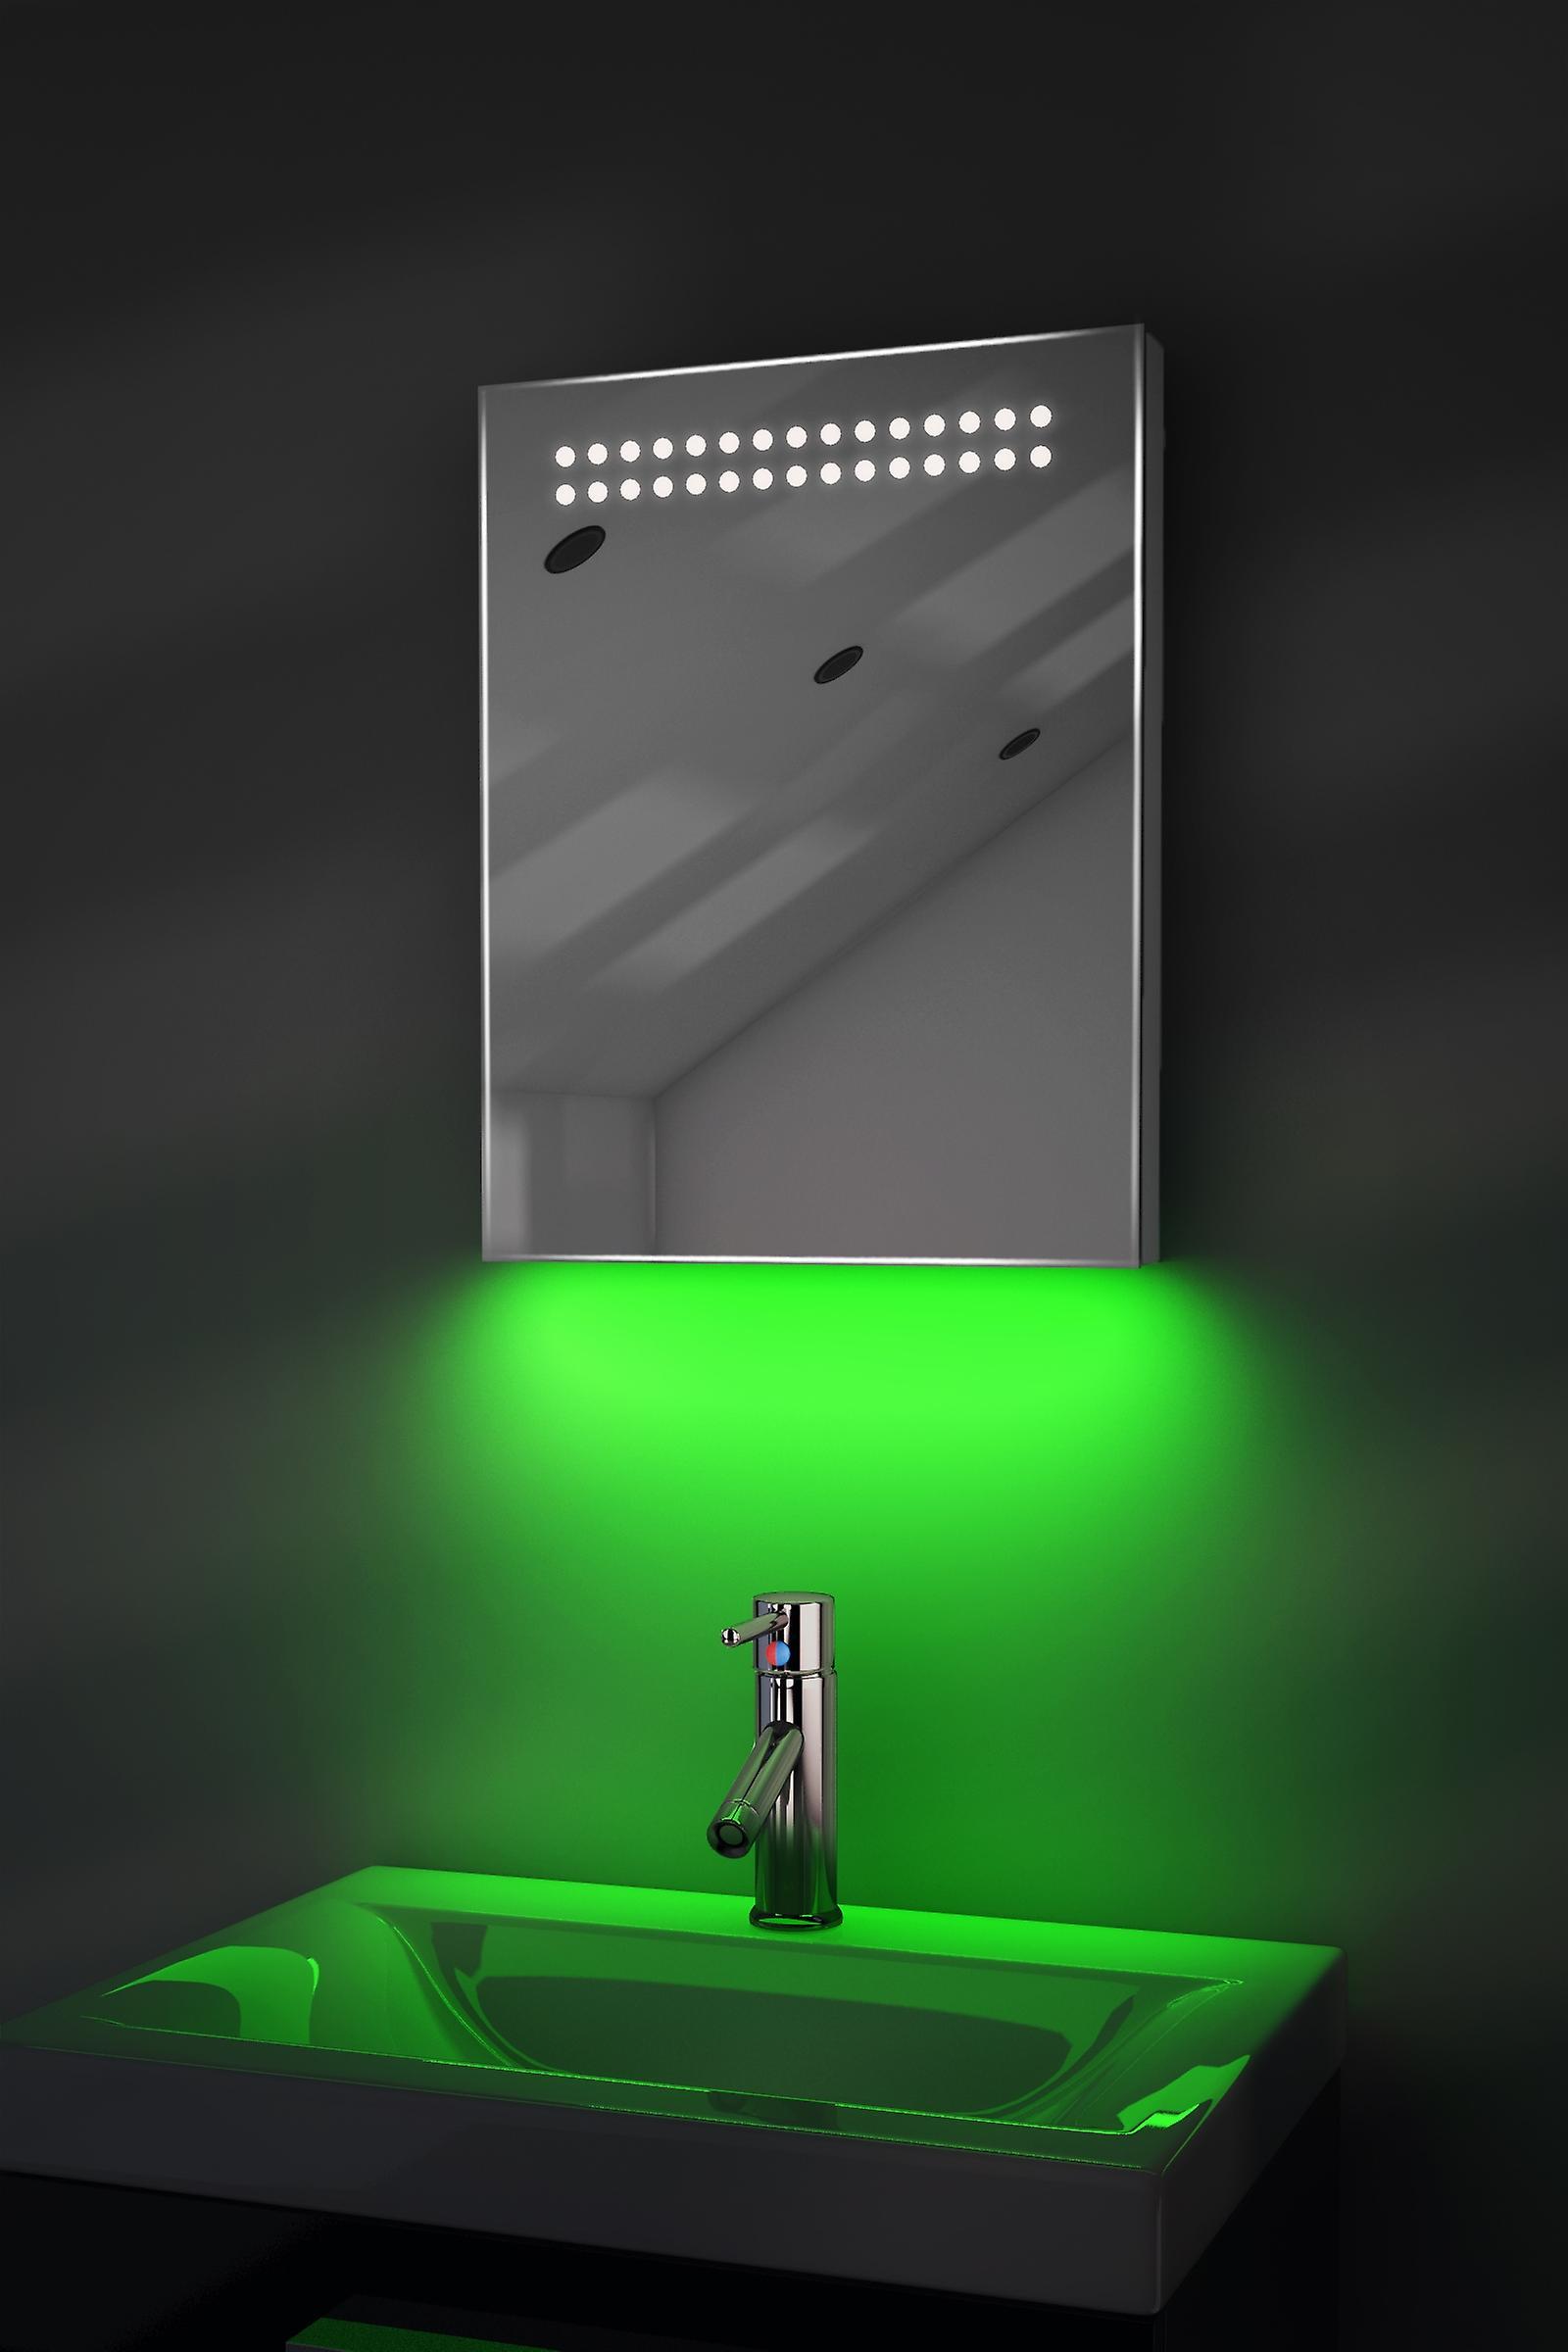 Auto Colour Change RGB with Bluetooth, Demist & Sensor k8srgbAud